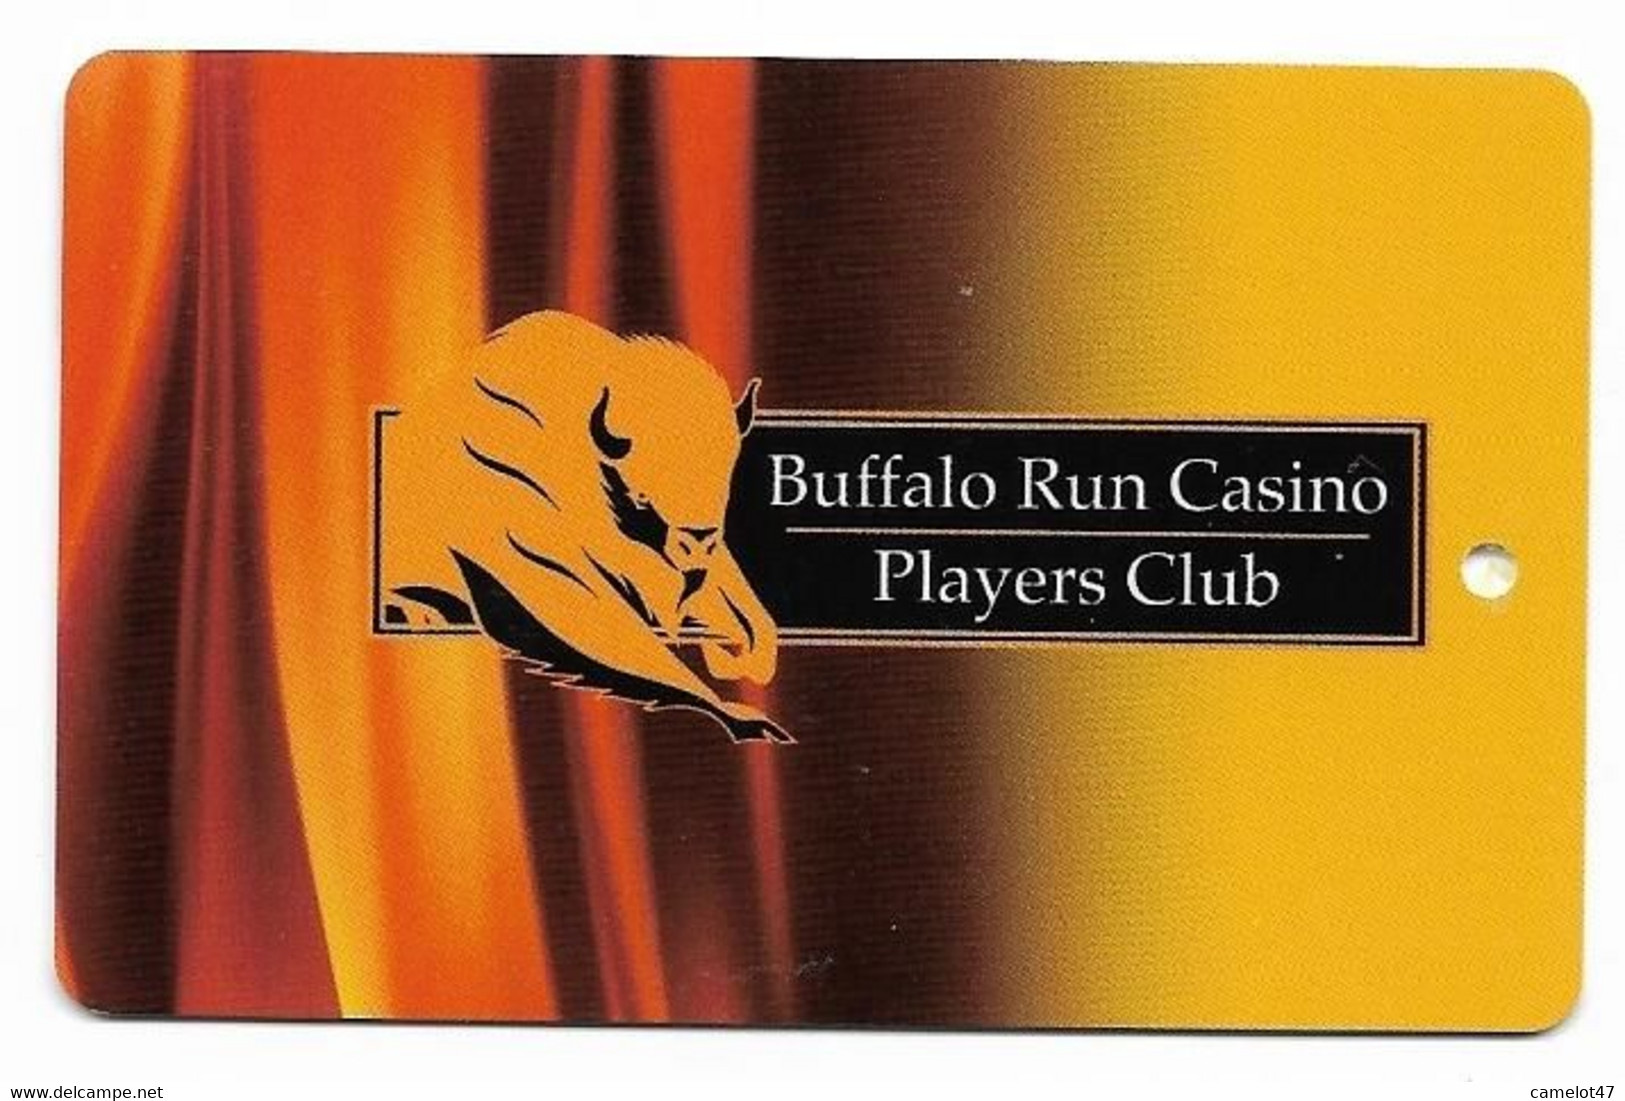 Buffalo Run Casino, Miami, OK, U.S.A., Older Used BLANK Slot Or Player's Card, # Buffalorun-2blank - Casino Cards